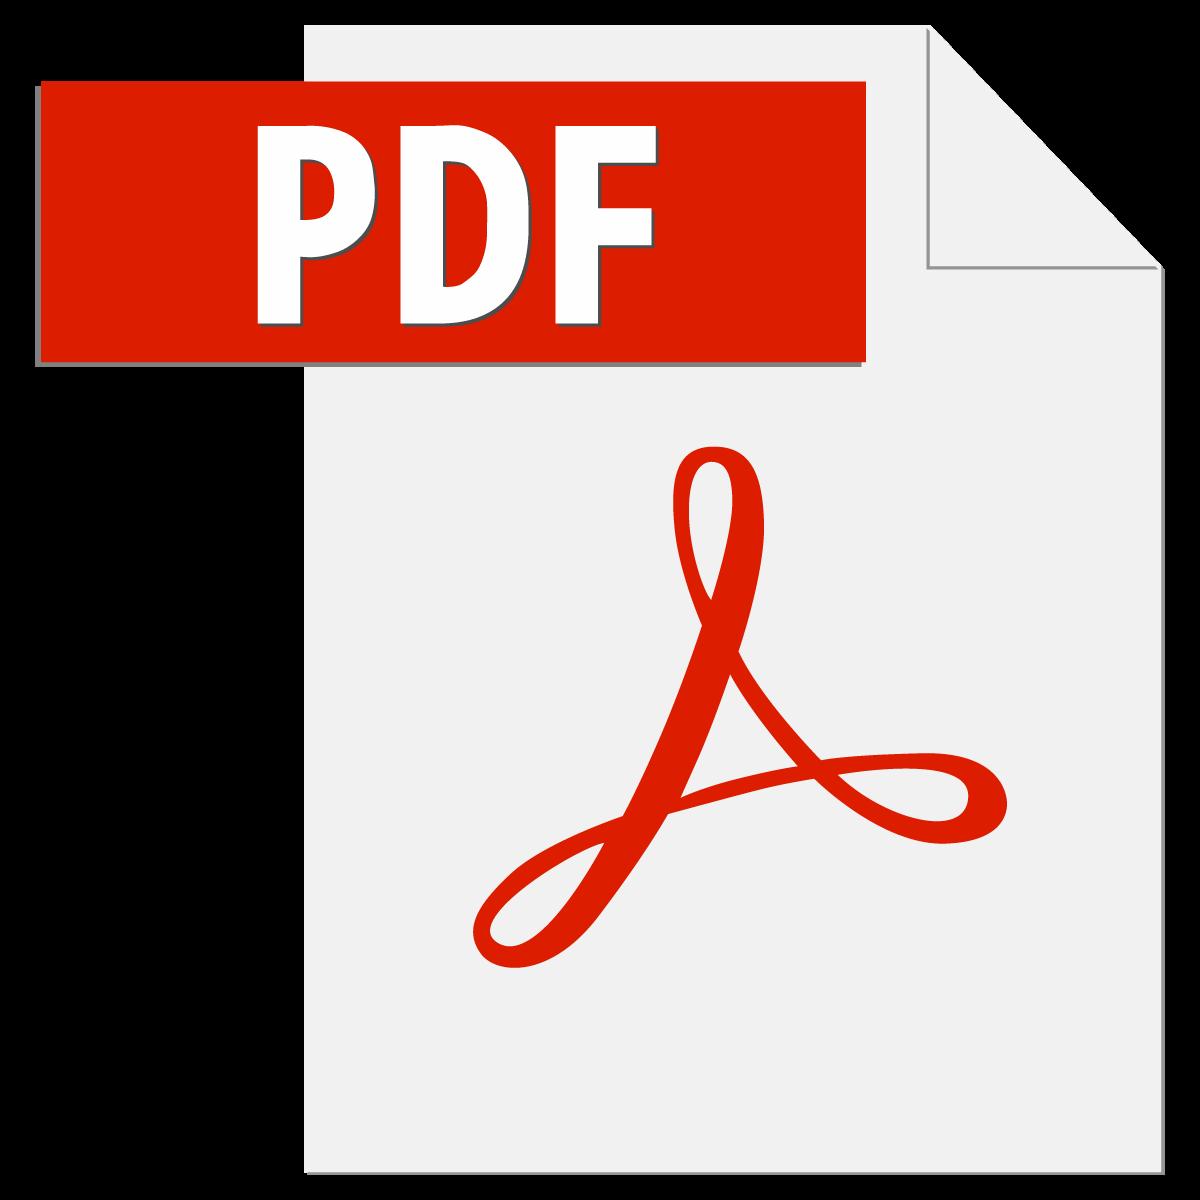 Pdf File Document Icon Download Pdf Button Royalty Free: Matchomatics